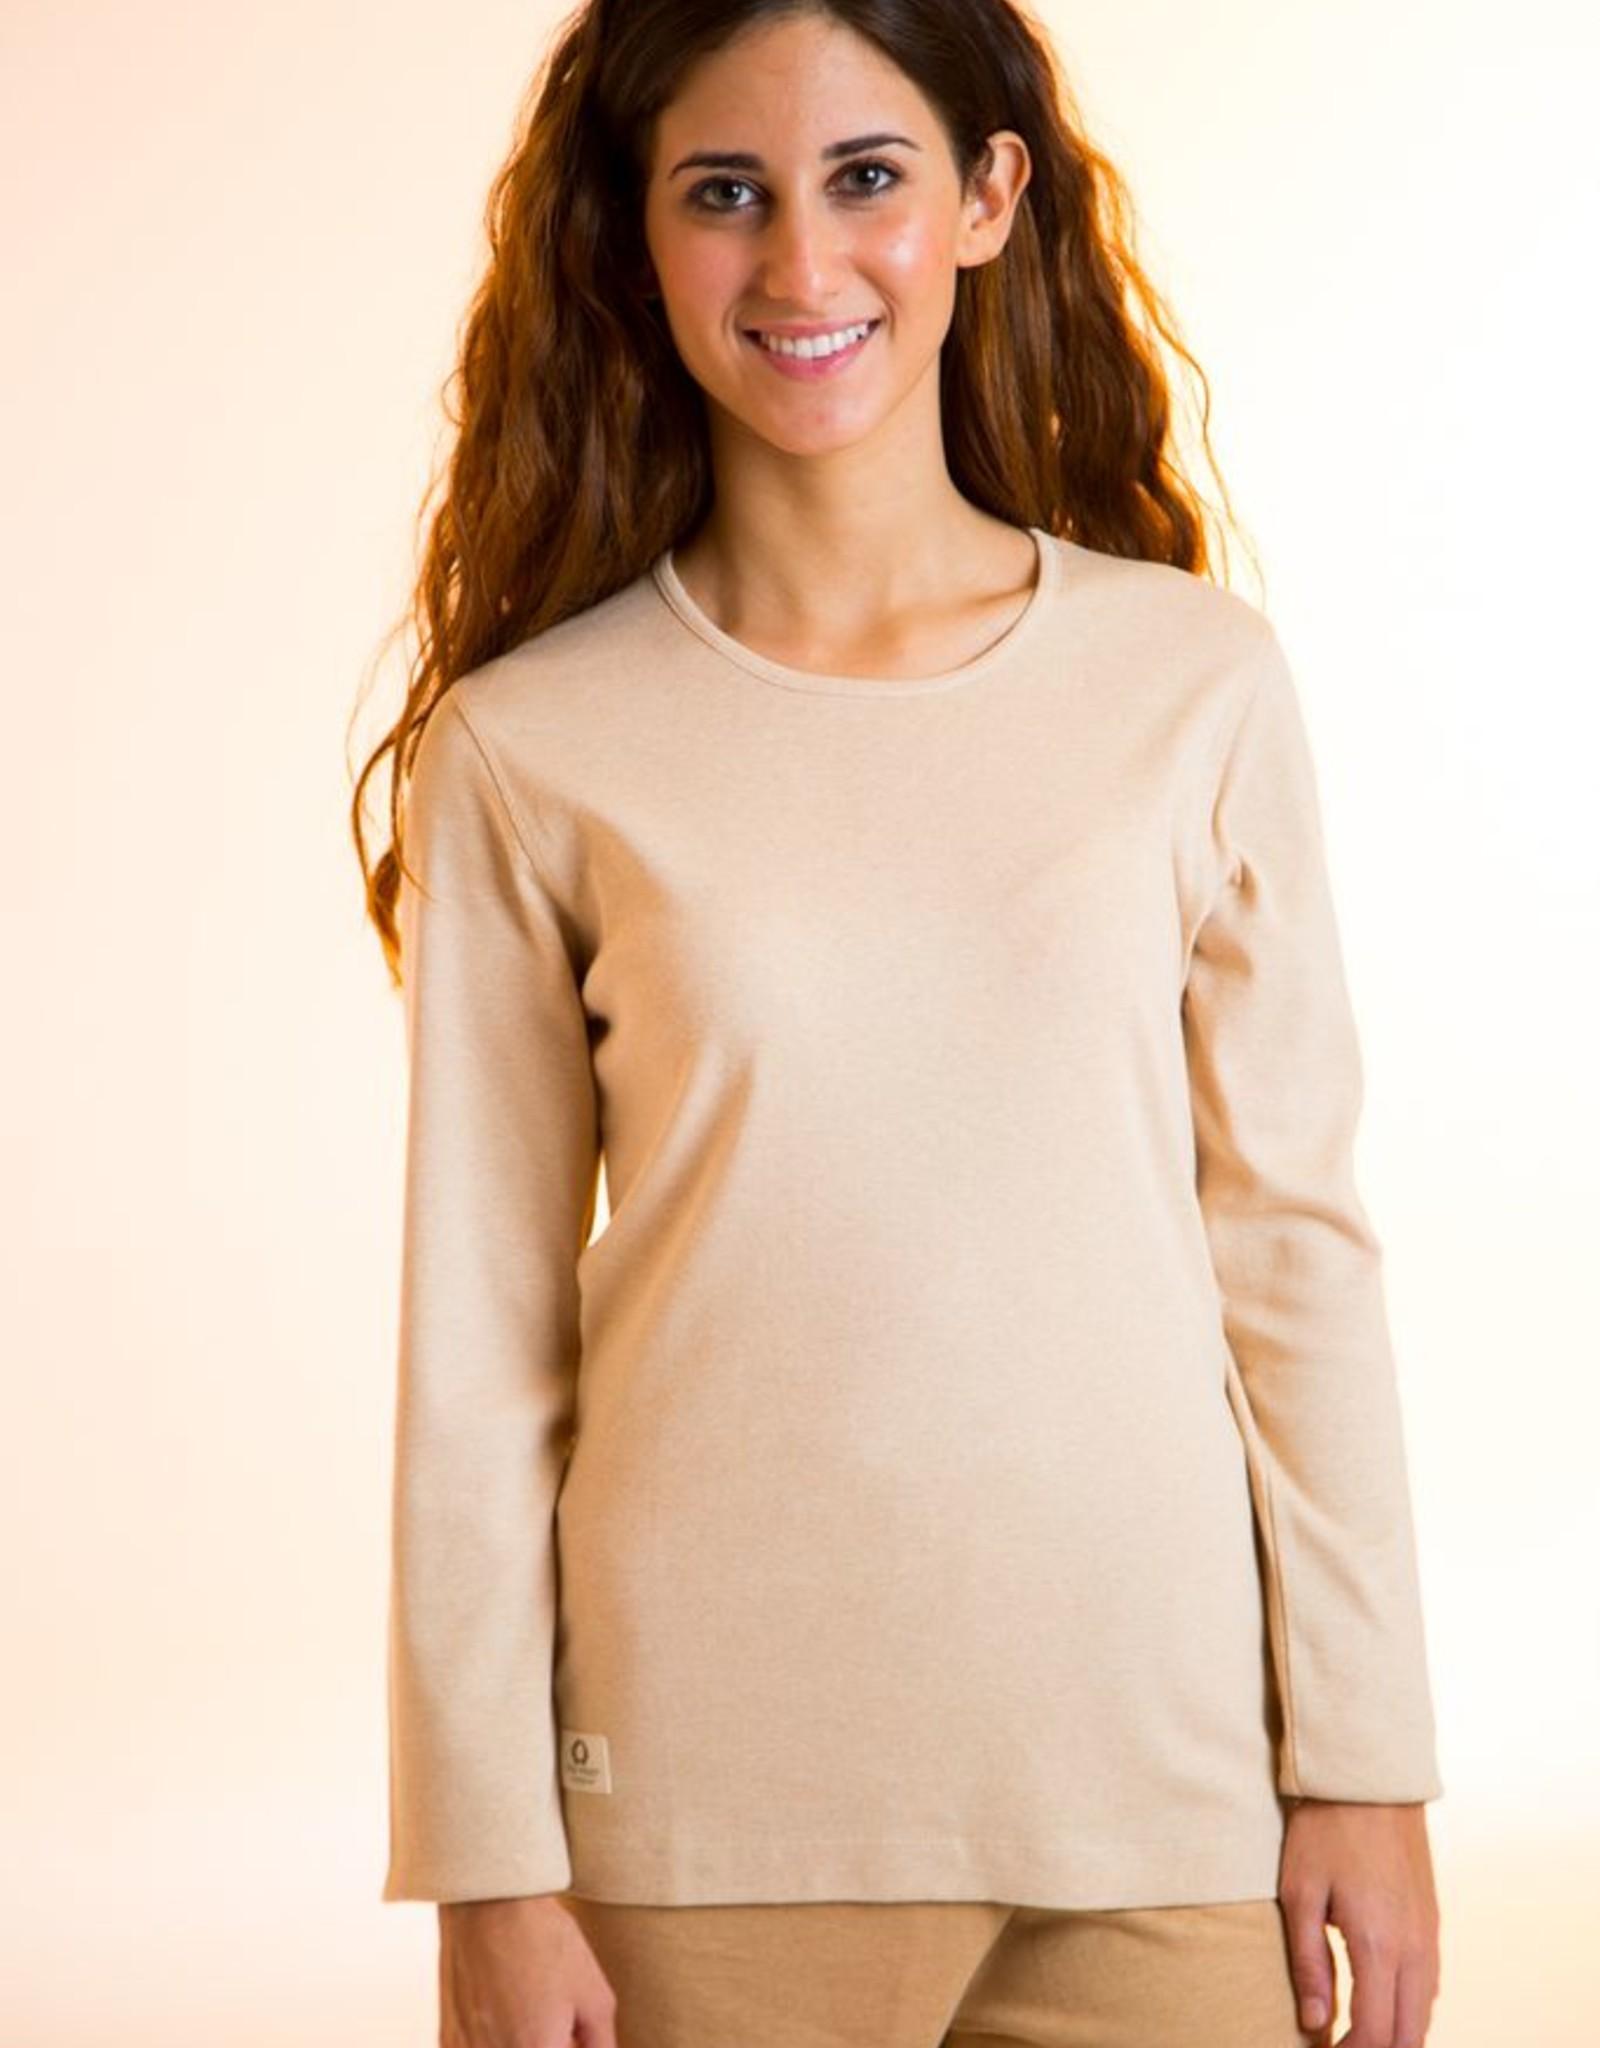 Camiseta mujer con cuello redondo y manga larga.